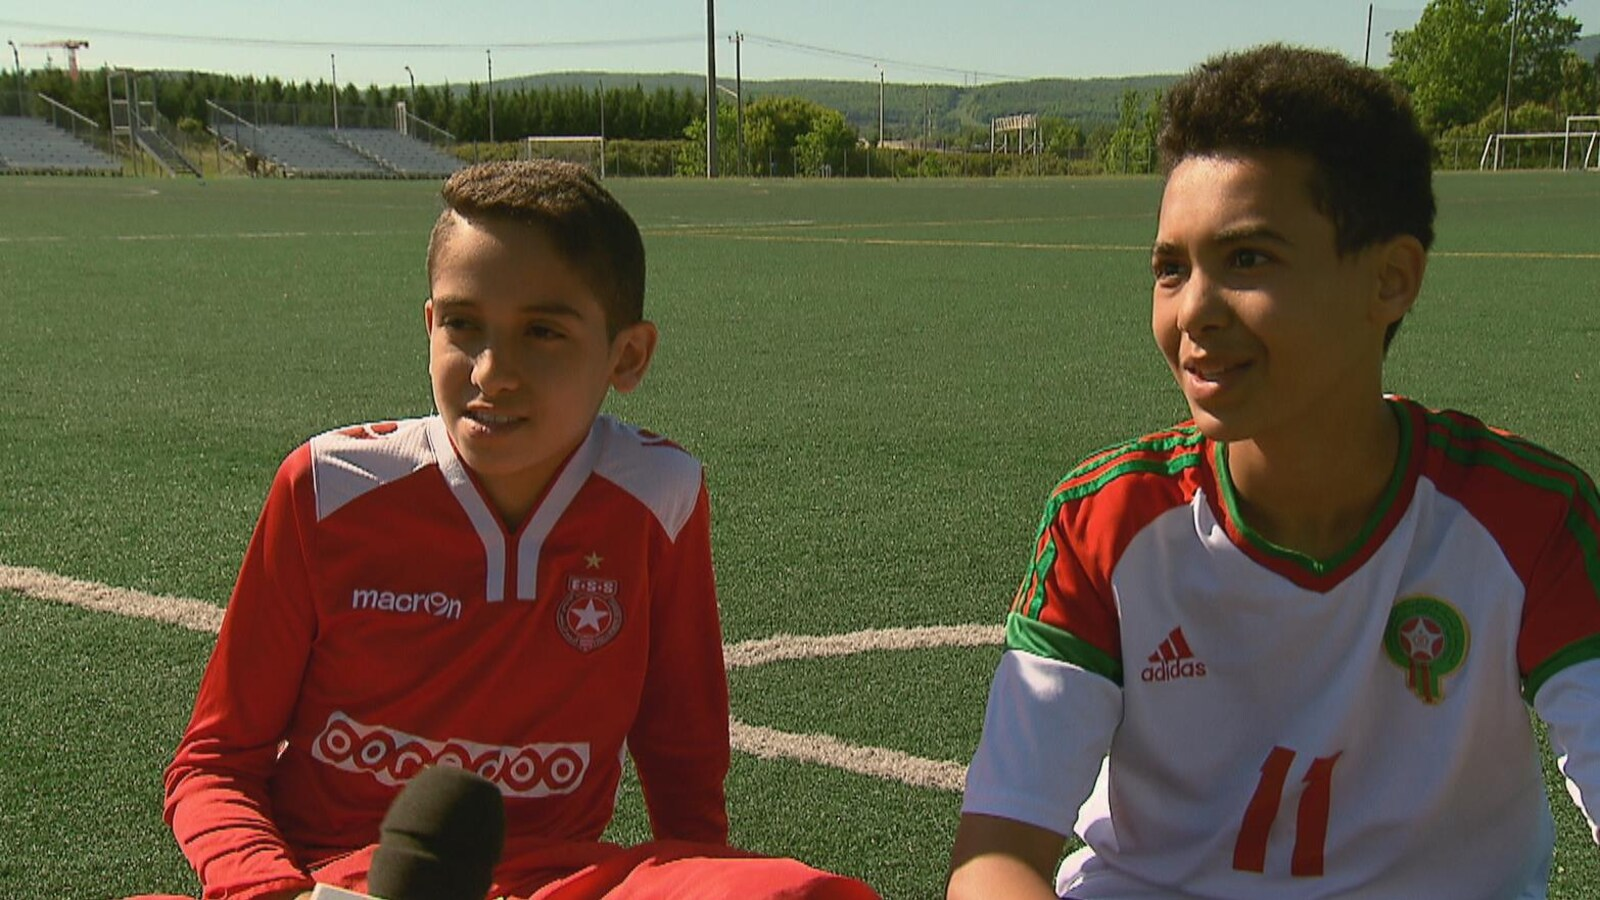 Yassine Zouari et Yassine Bouibes